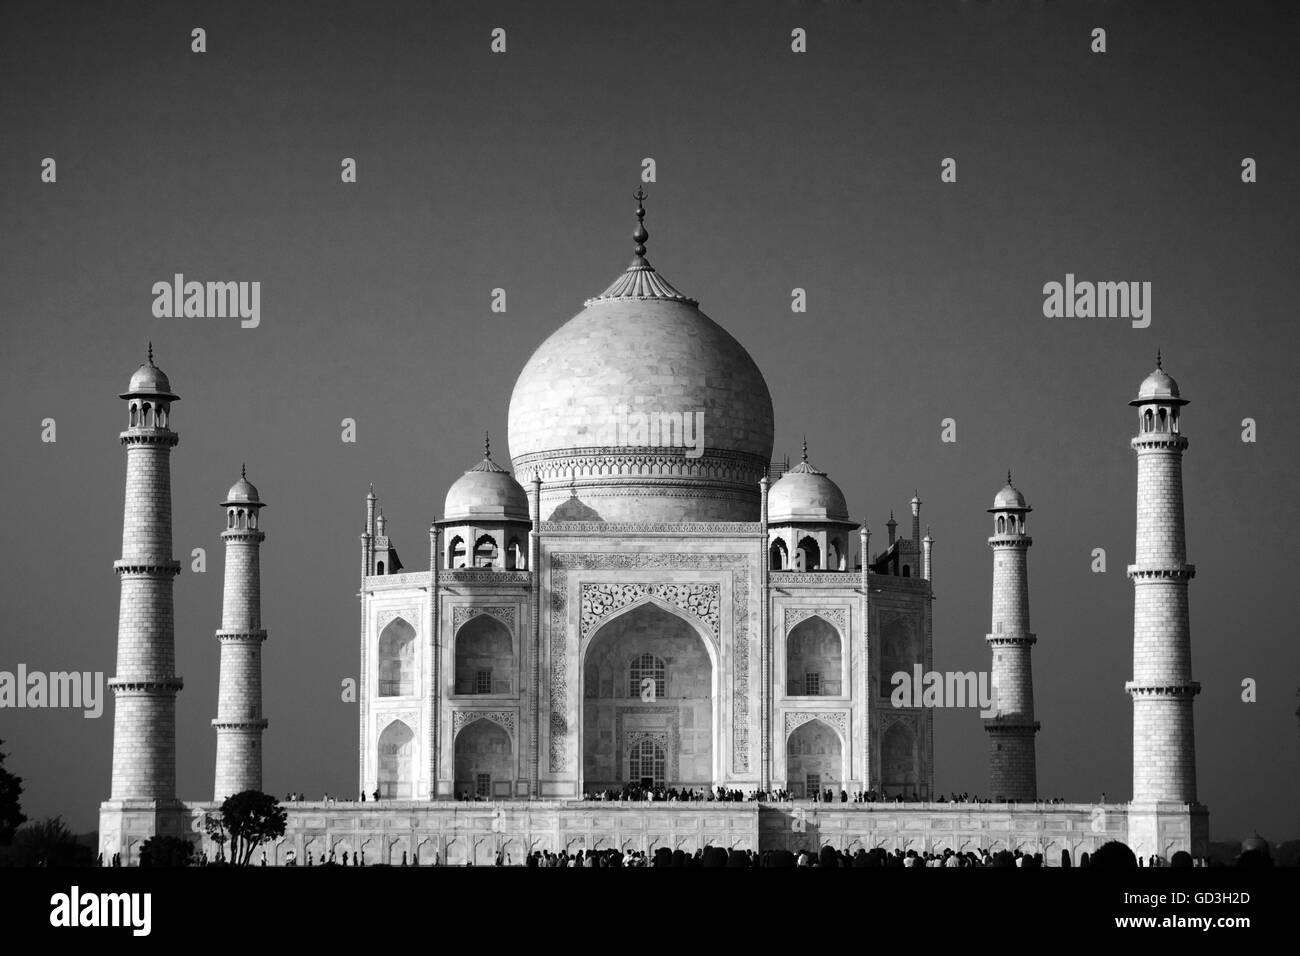 Taj Mahal, Agra, Northern India, Asia - Stock Image